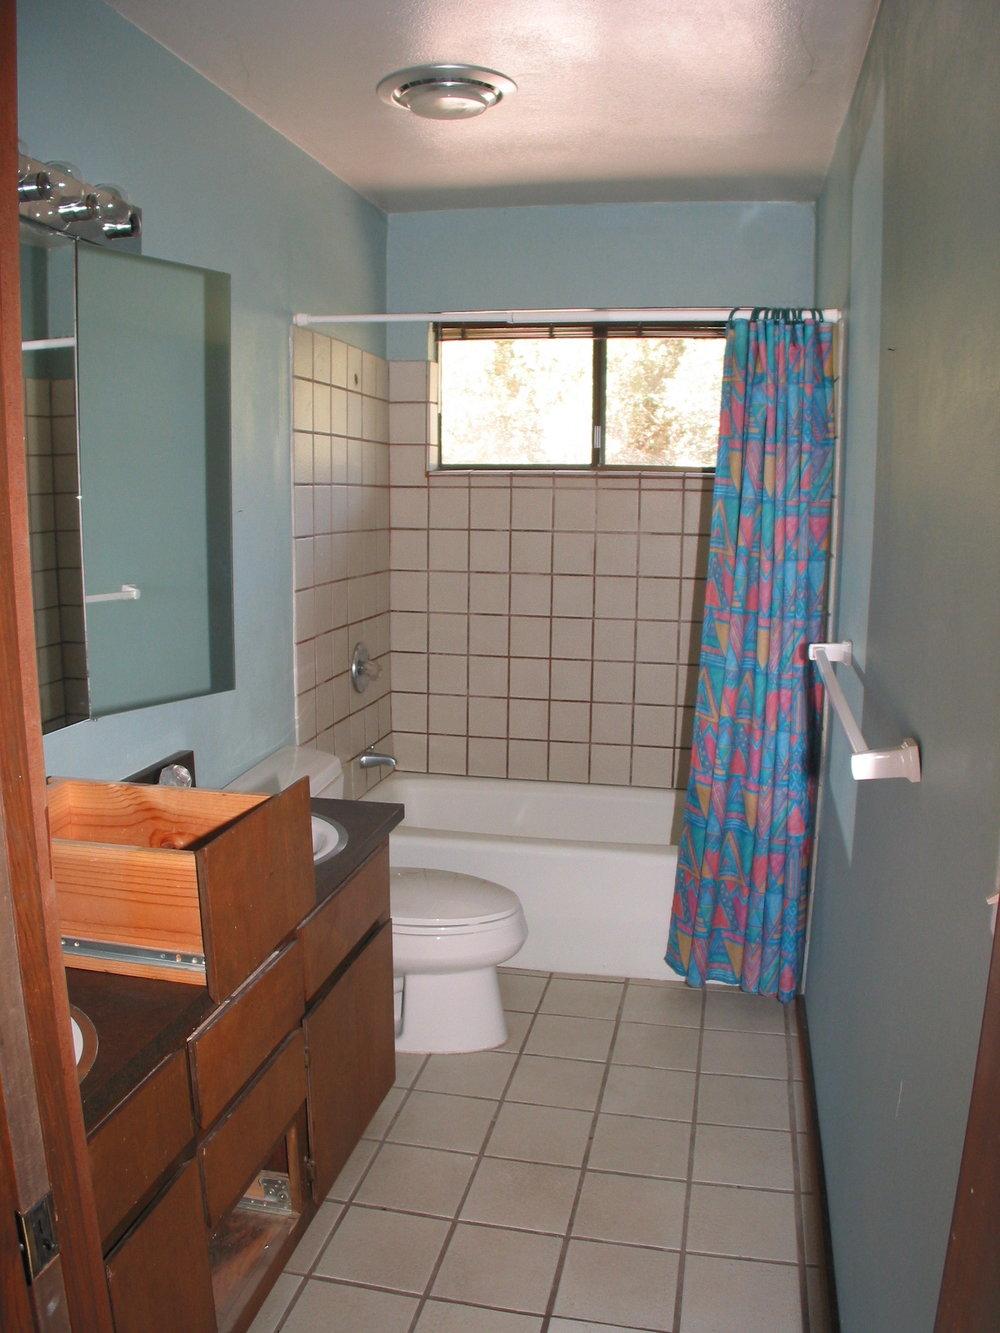 Hall Bath - before.JPG